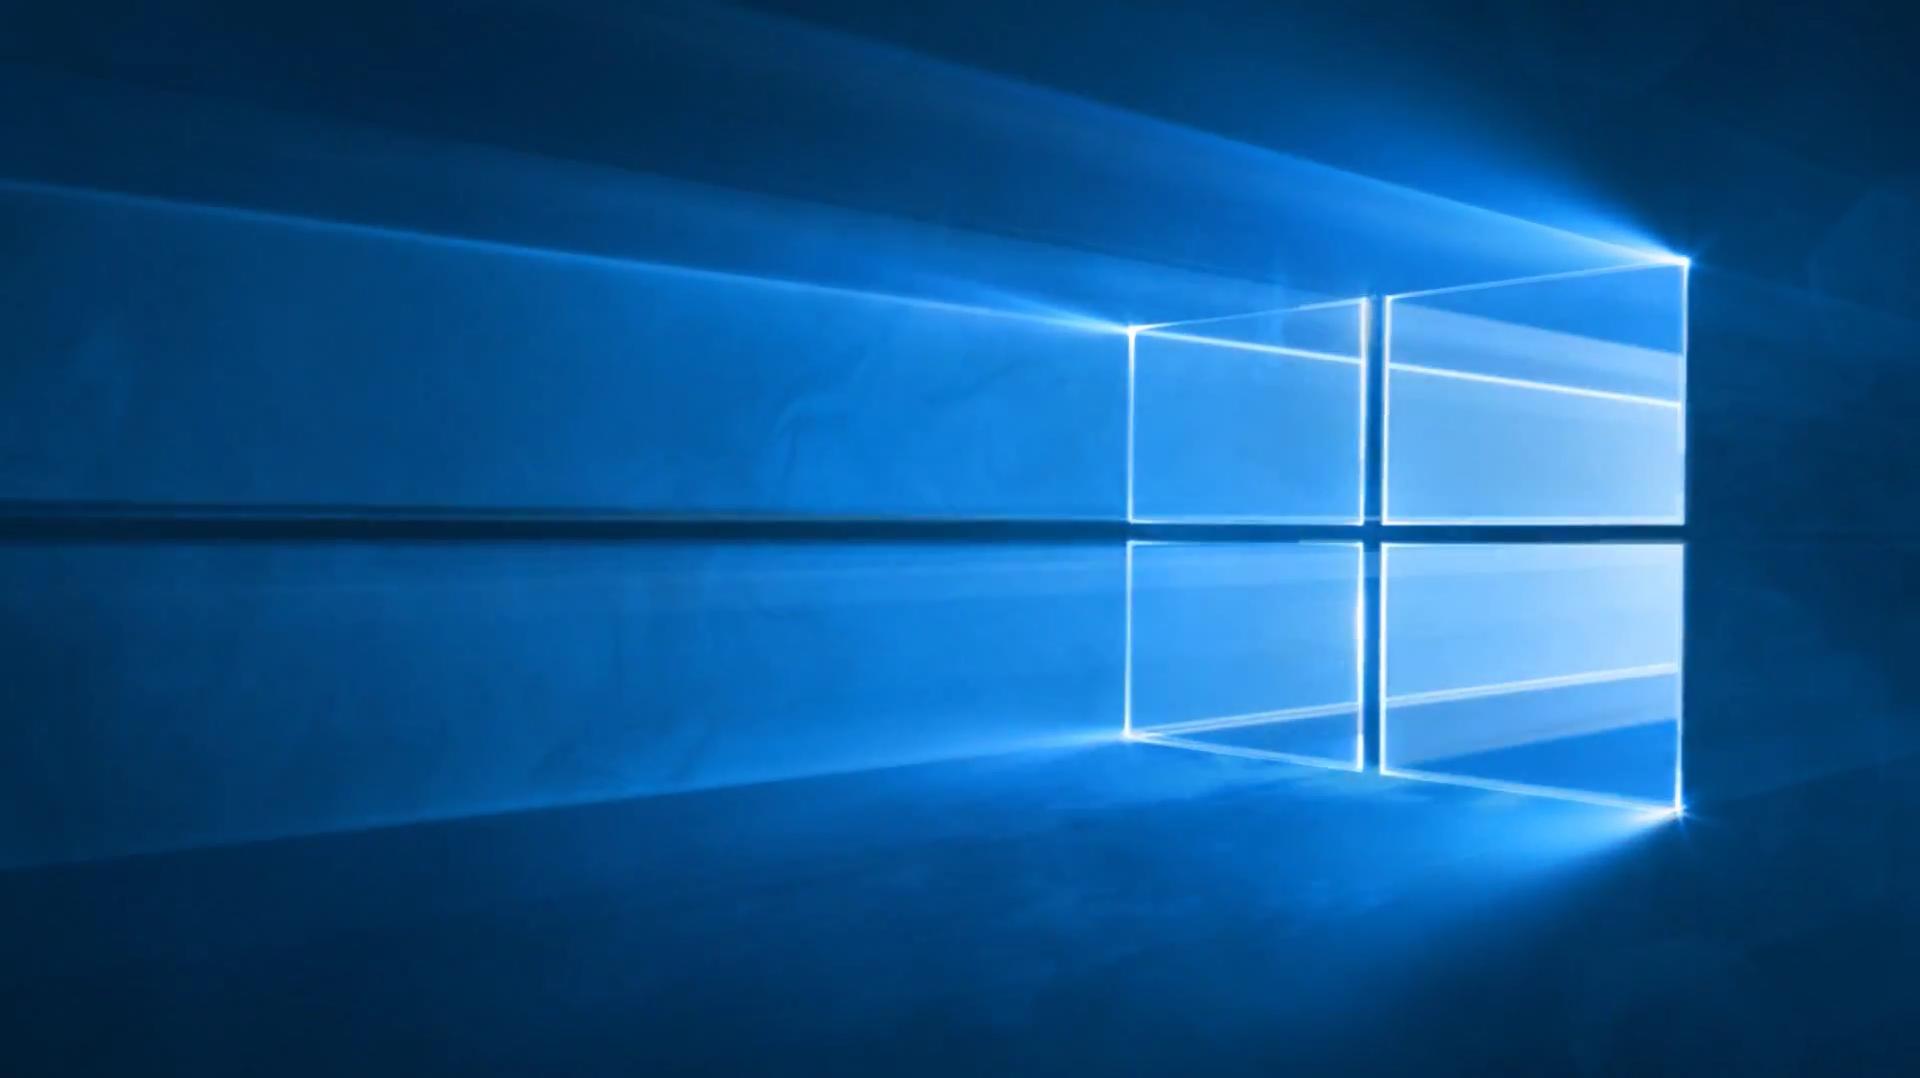 how to get windows 10 lockscreen wallpaper